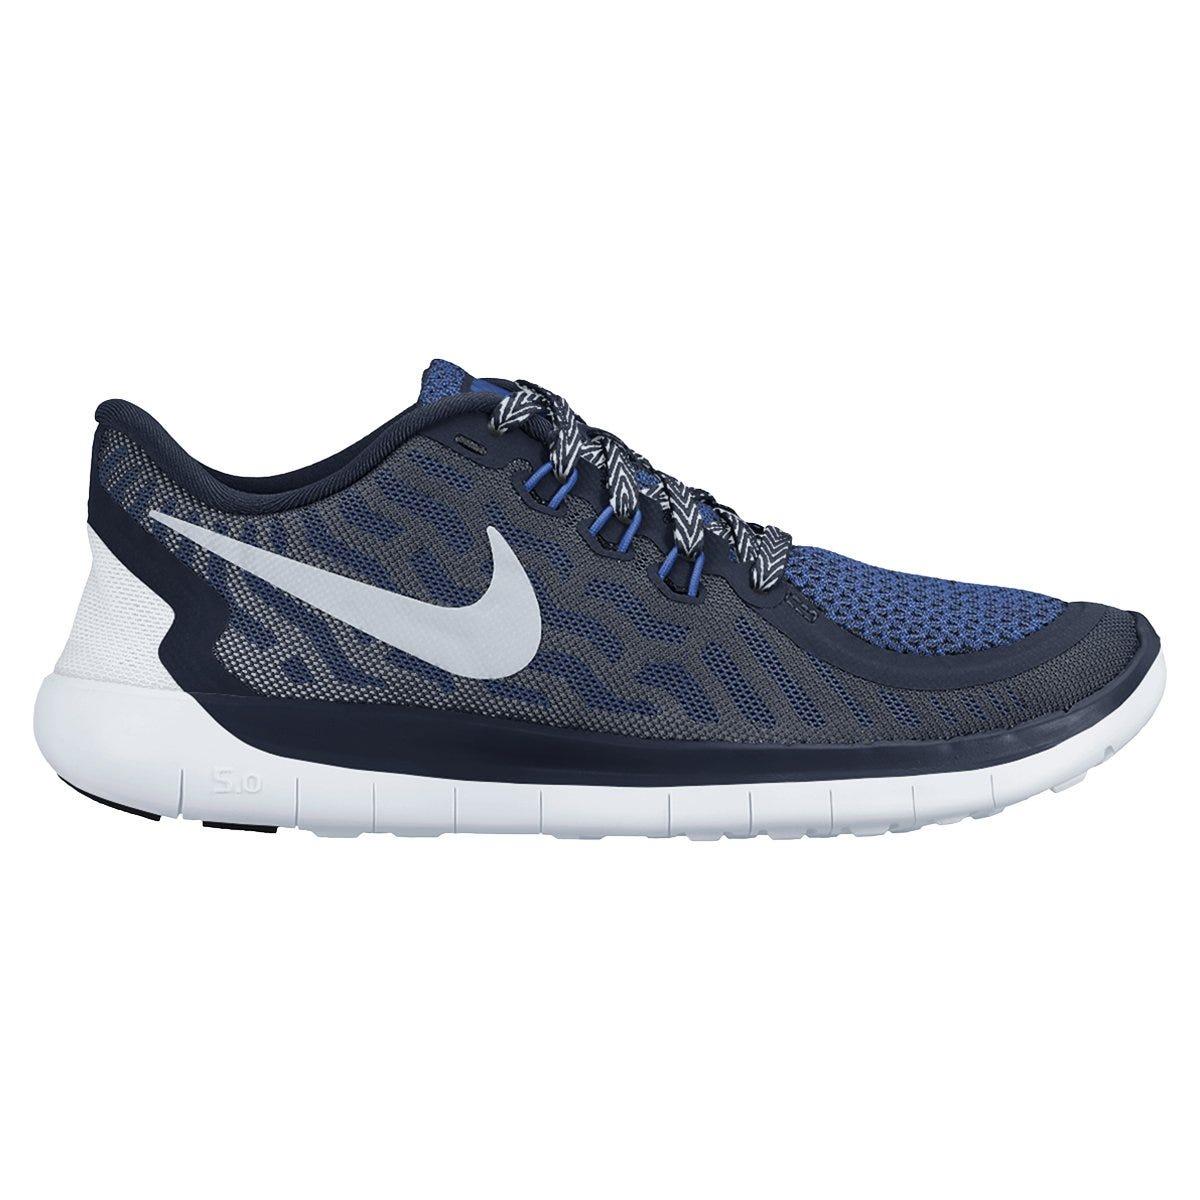 Nike Free 5.0 Boy's Running Shoe - Obsidian/Wolf Grey/Silver